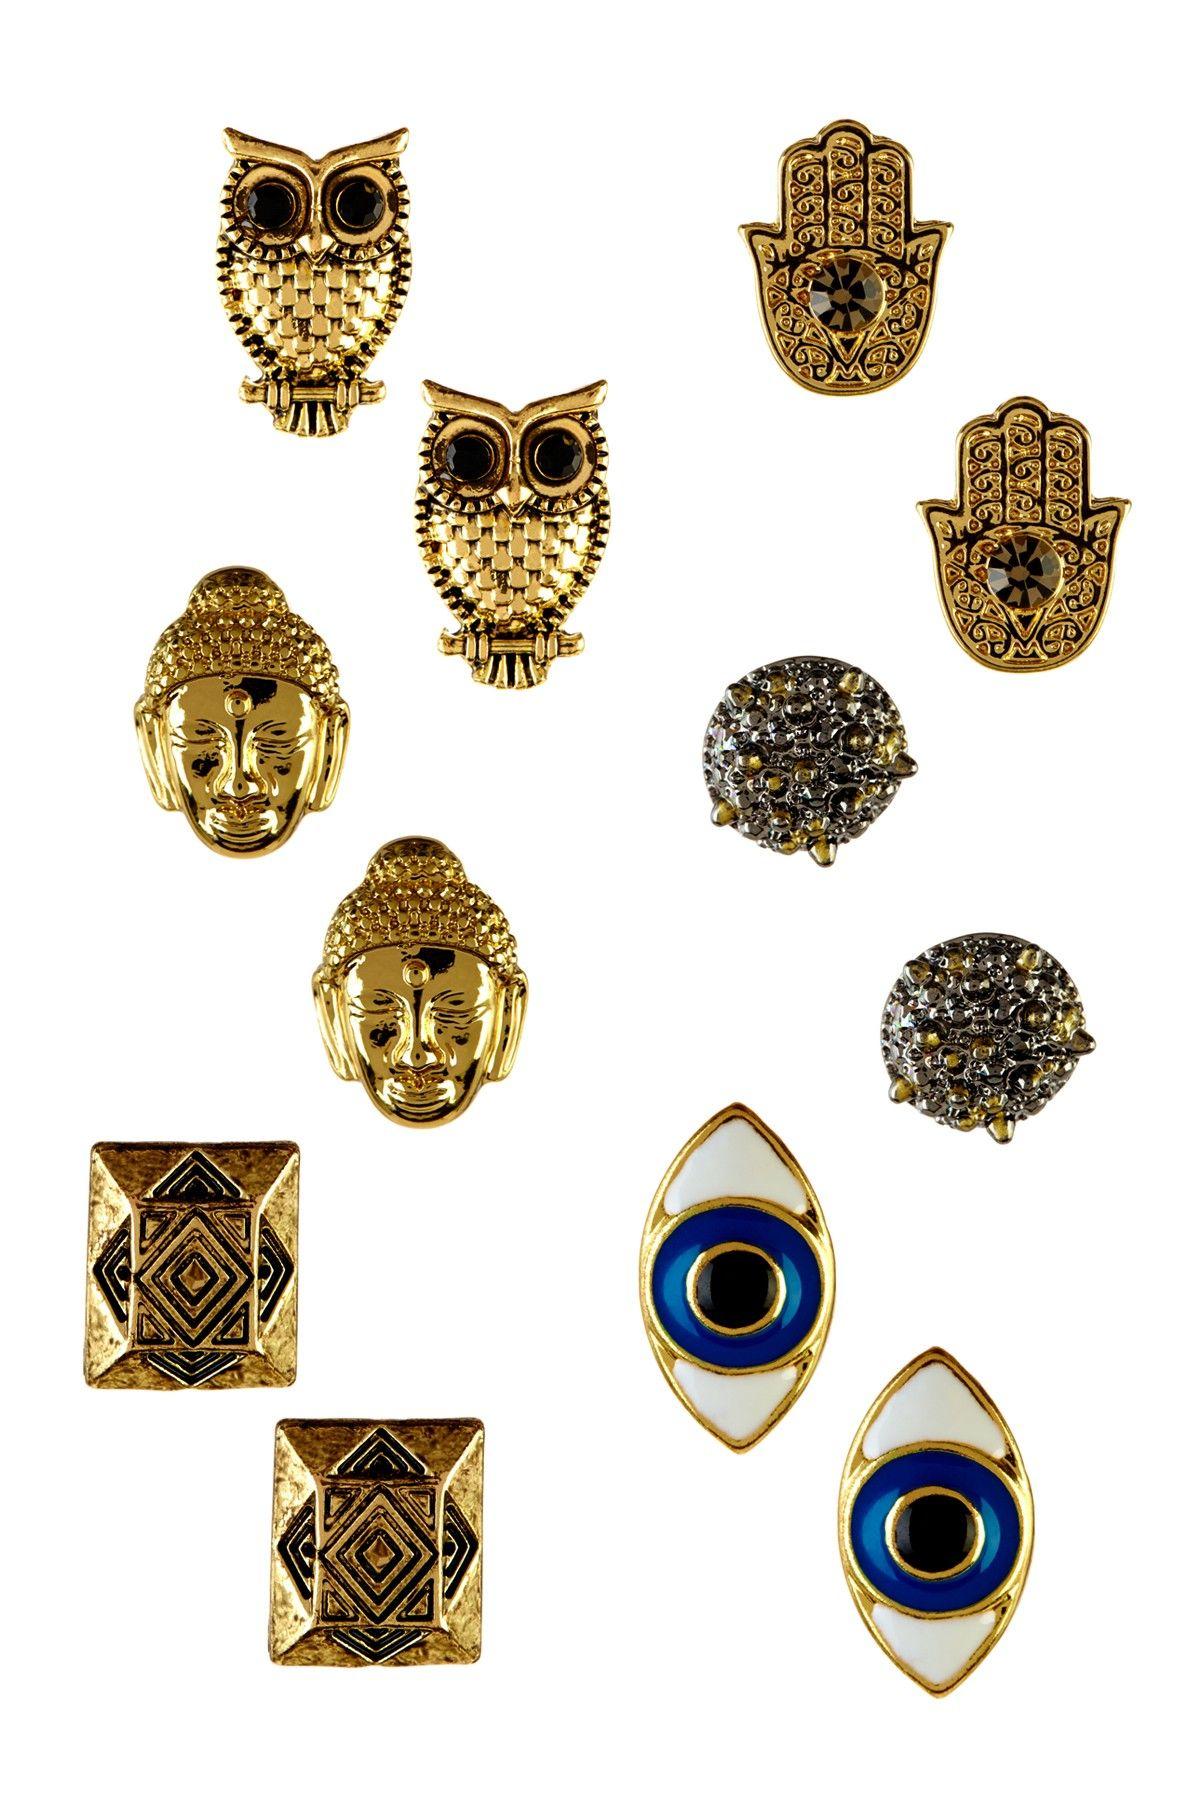 Pipa Swarovski Crystal Stud Gold Earrings Set - owls, Buddha, evil eye, oh my!